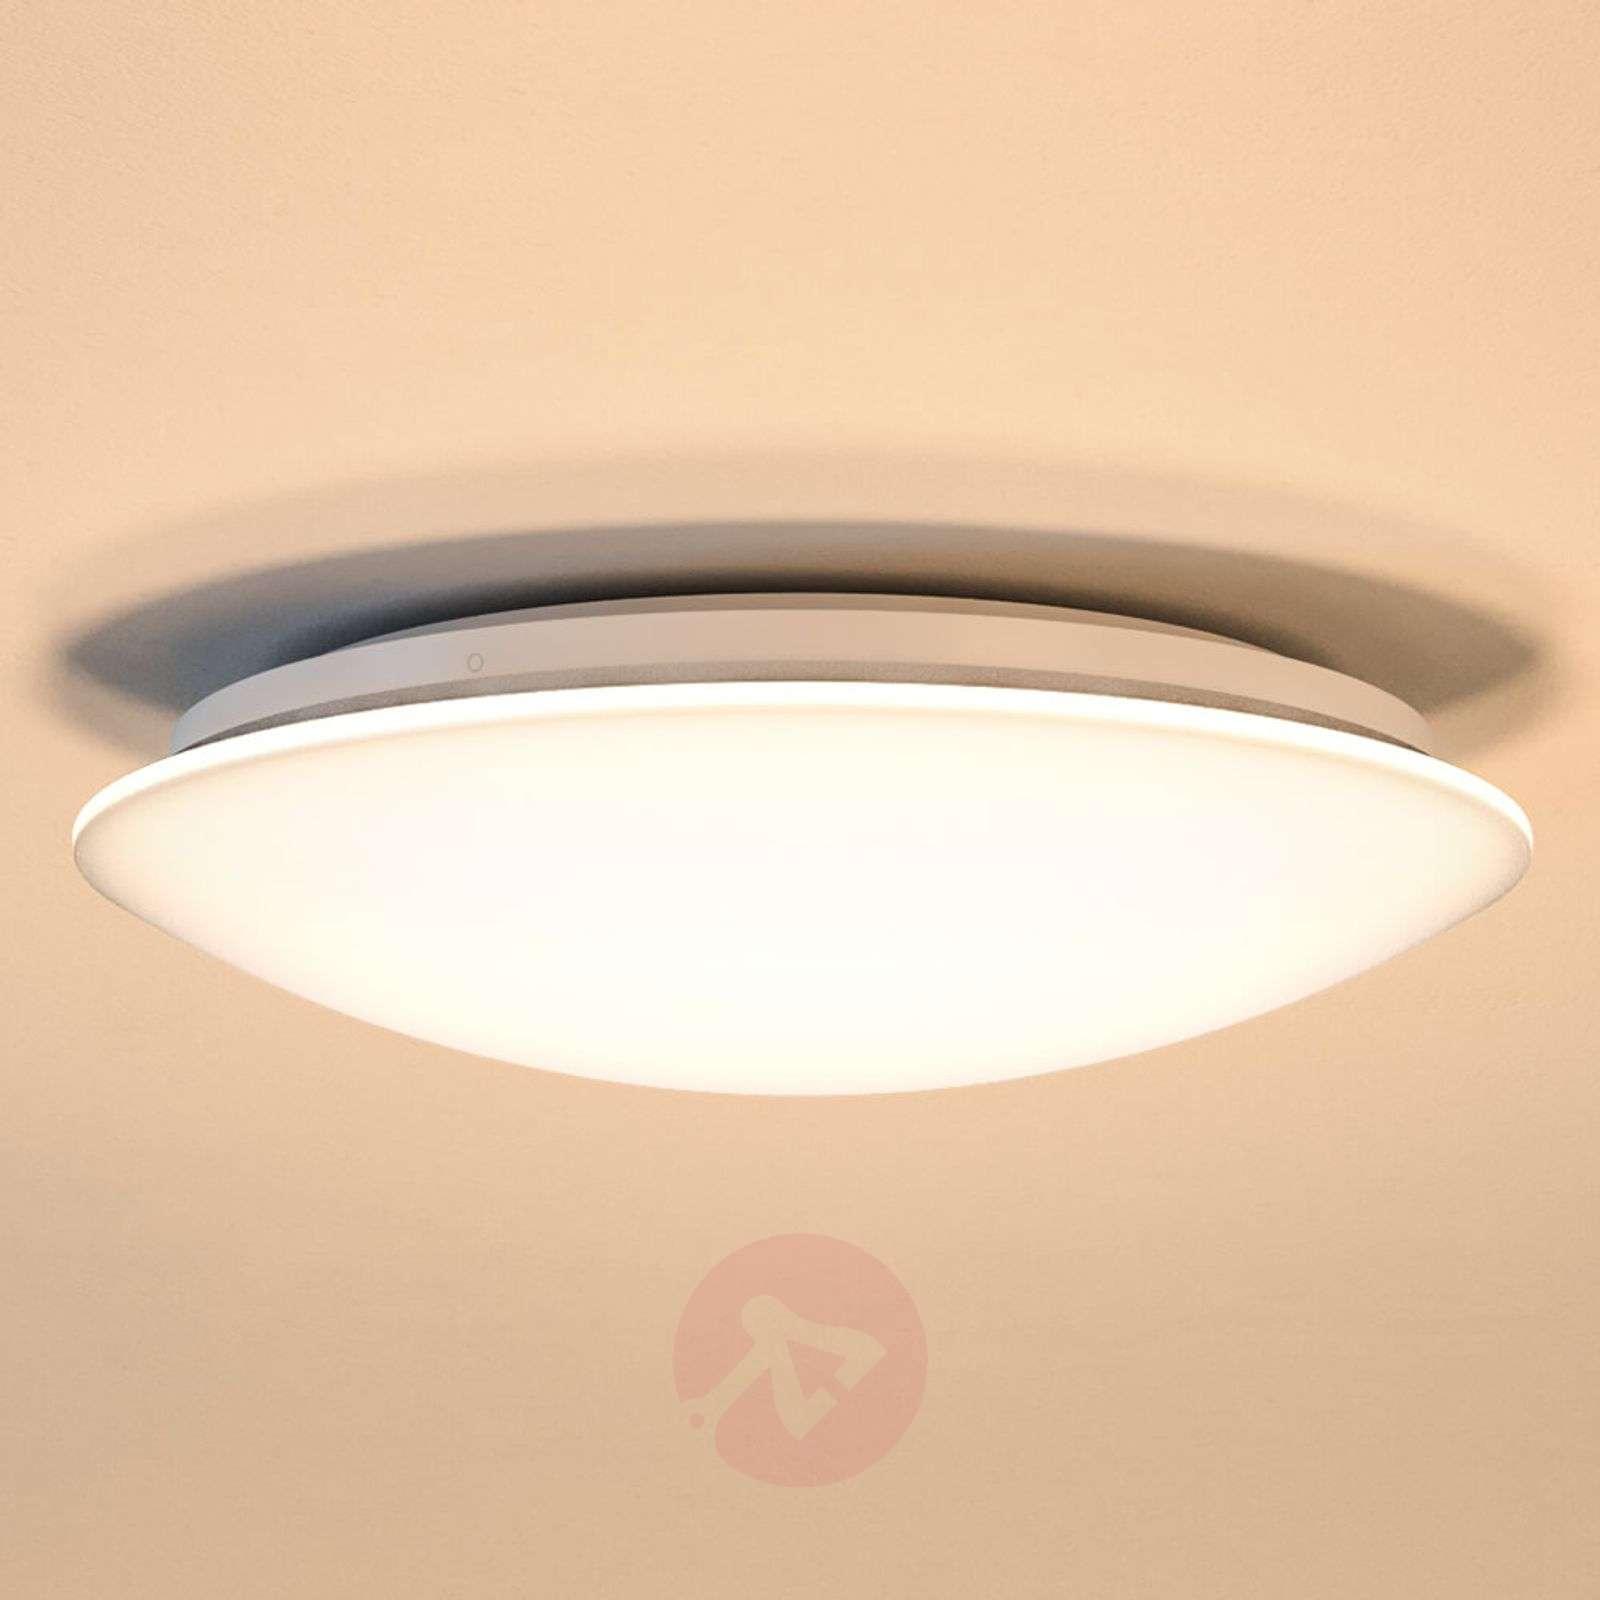 Bright LED ceiling lamp Mauve 2,000 lumens-7531982-01